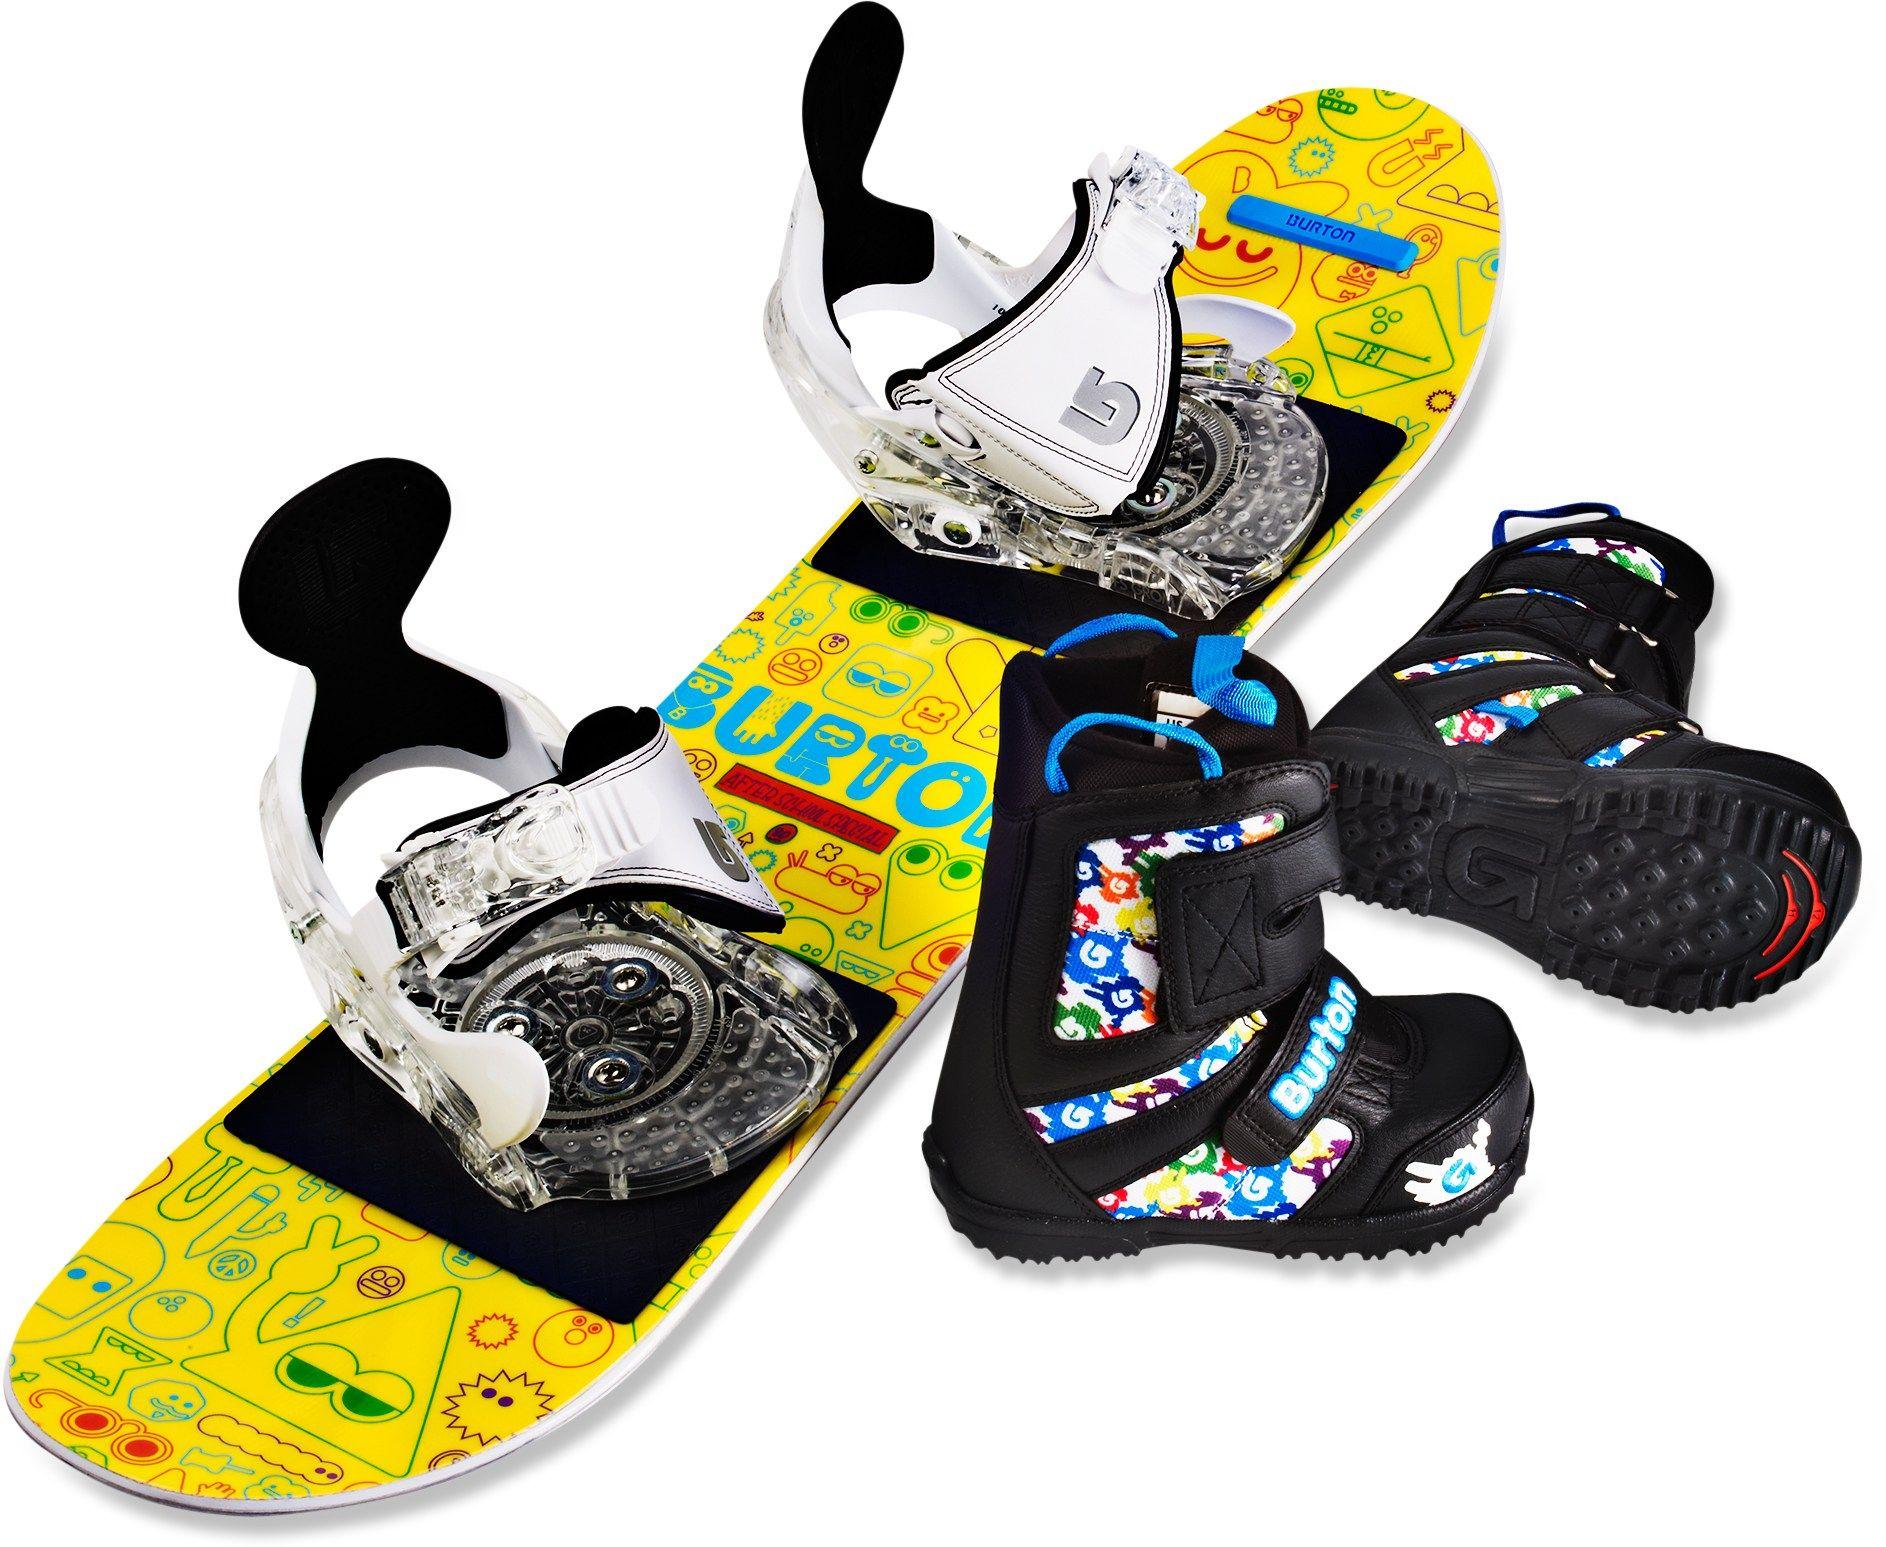 Burton After School Special Snowboard Package - Kids ...